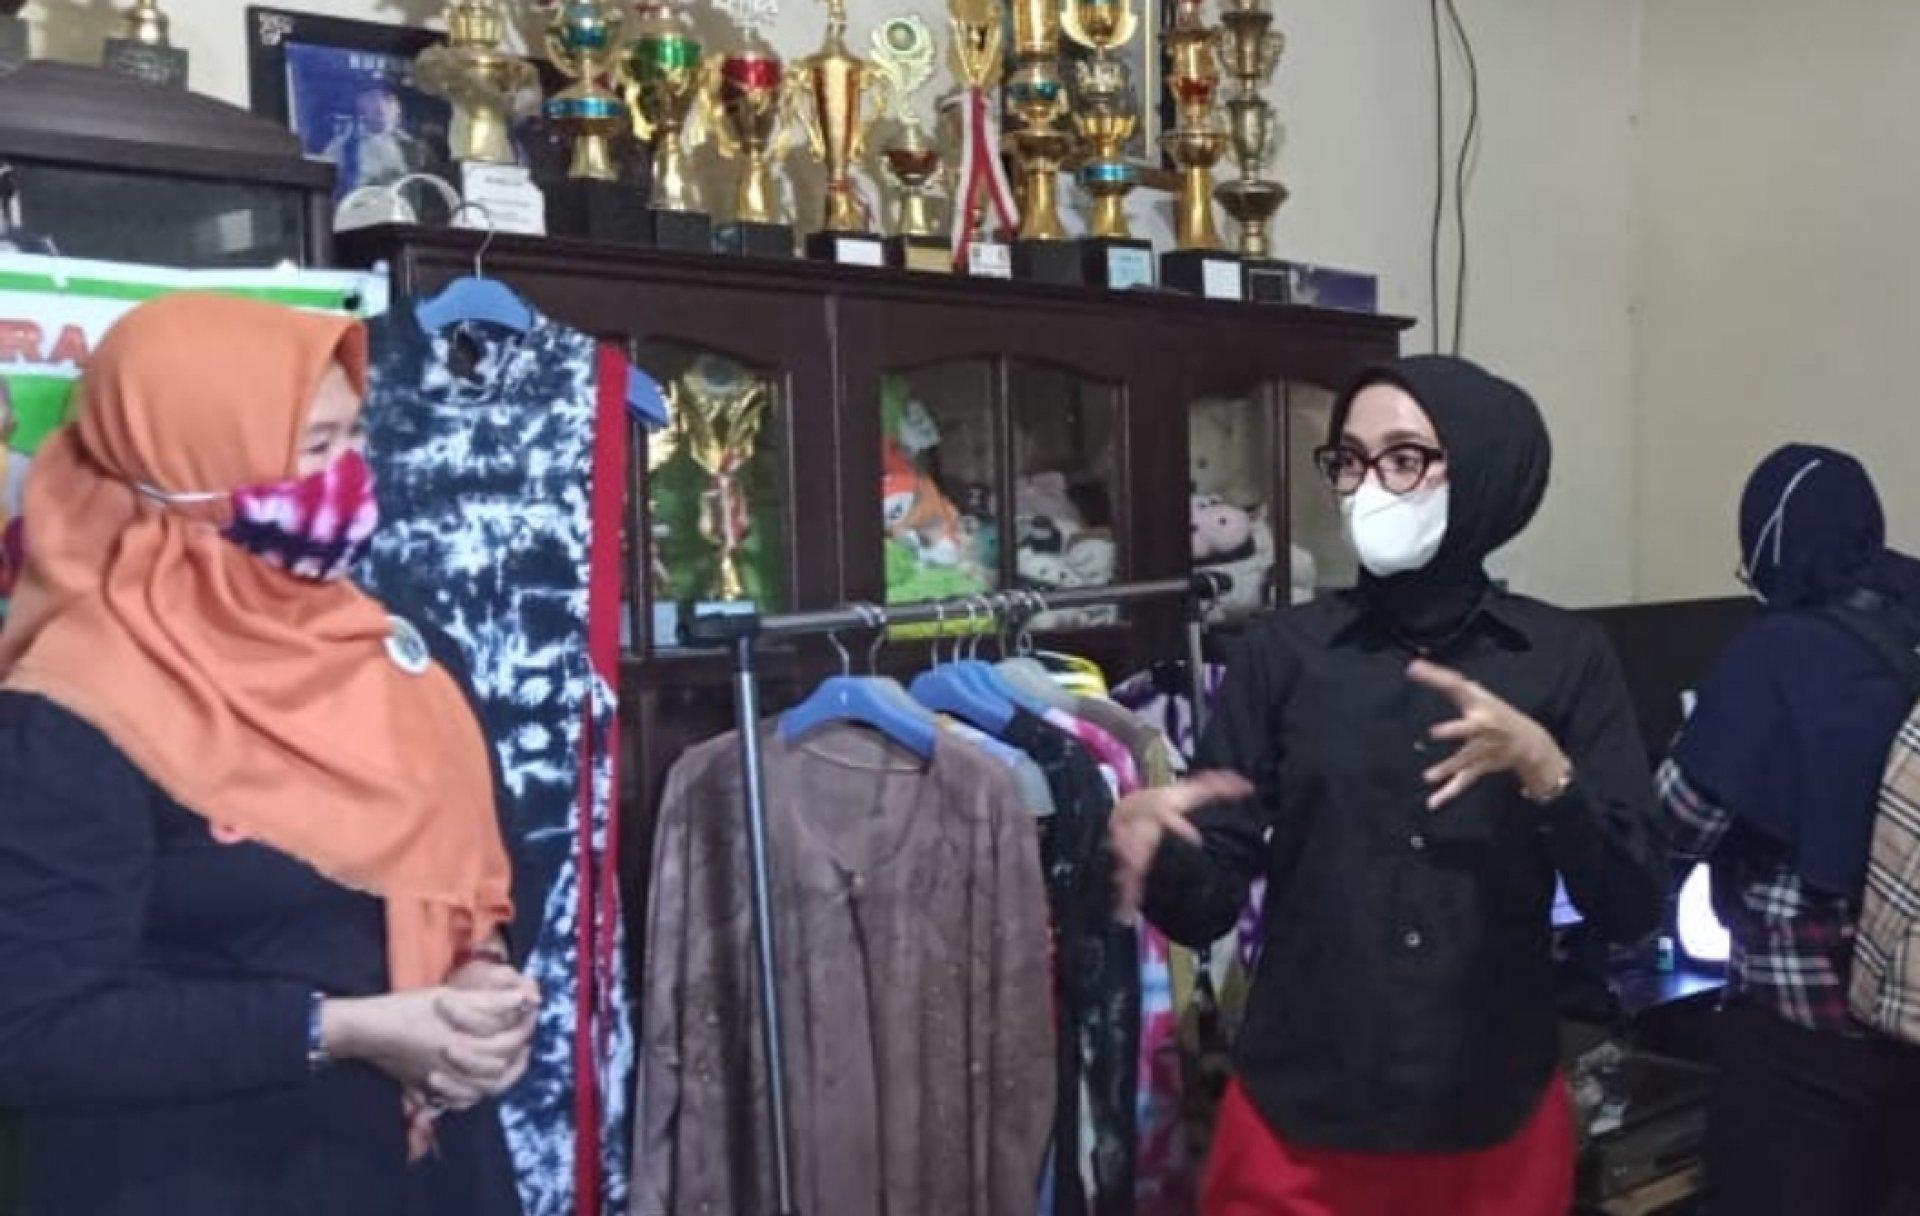 Dukung Pengembangan Usaha Lokal, Ketua Dekranasda Kalteng Kunjungi Sentra UMKM di Kota Sampit